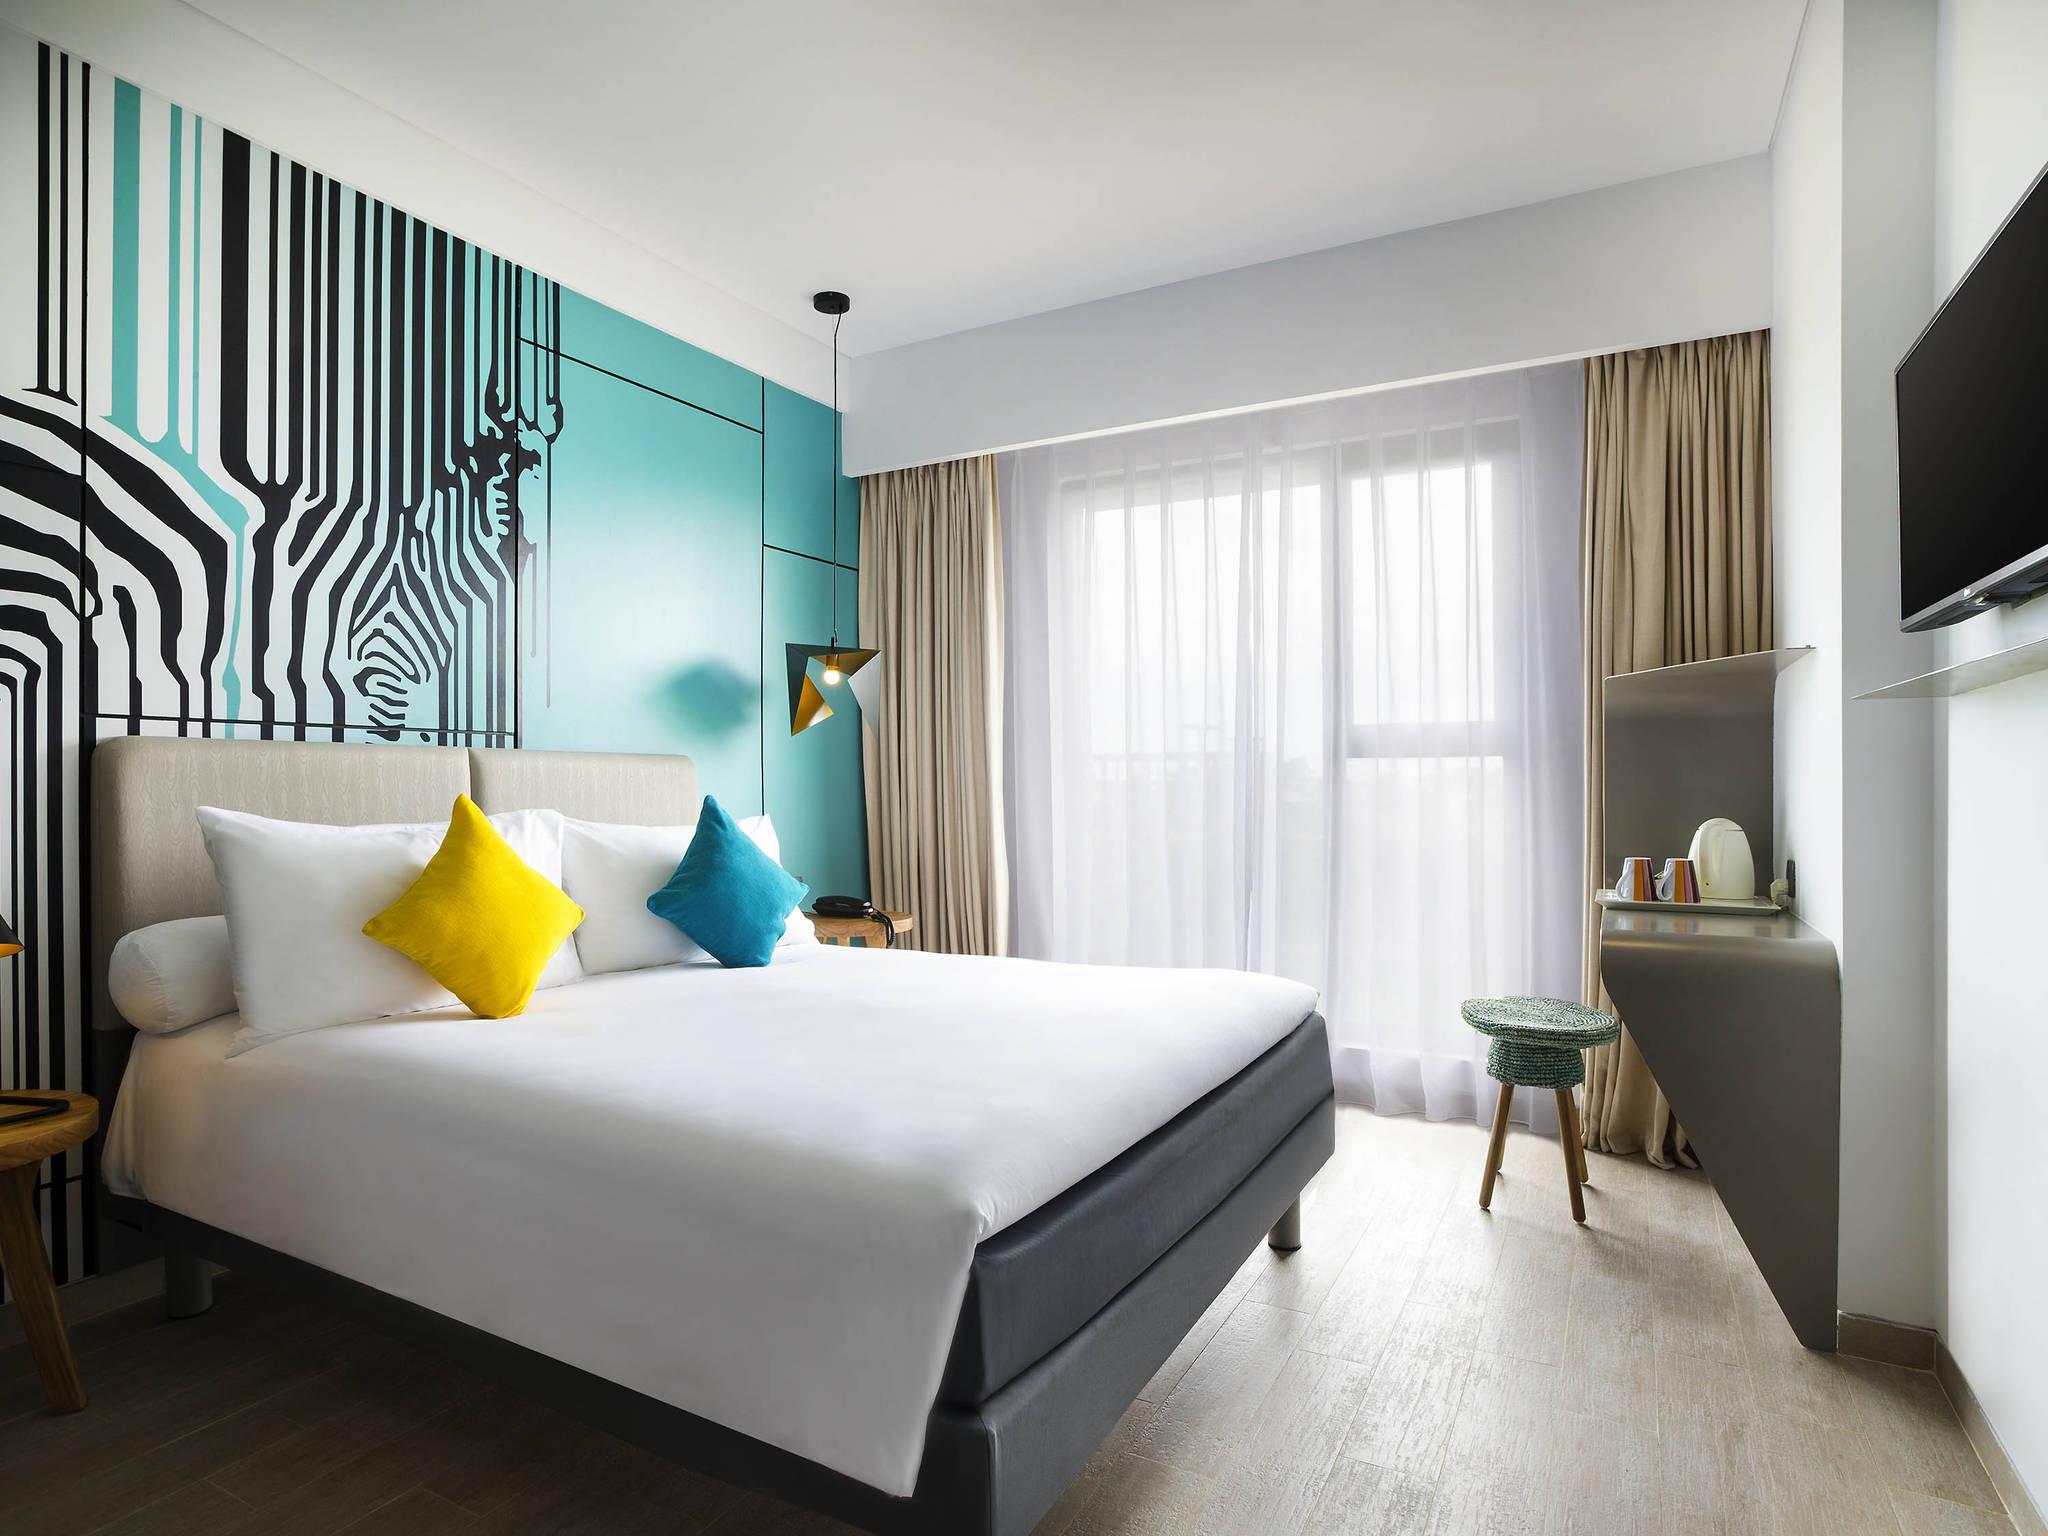 Hotel in SEMINYAK - Ibis Styles Bali Petitenget, Accorhotels